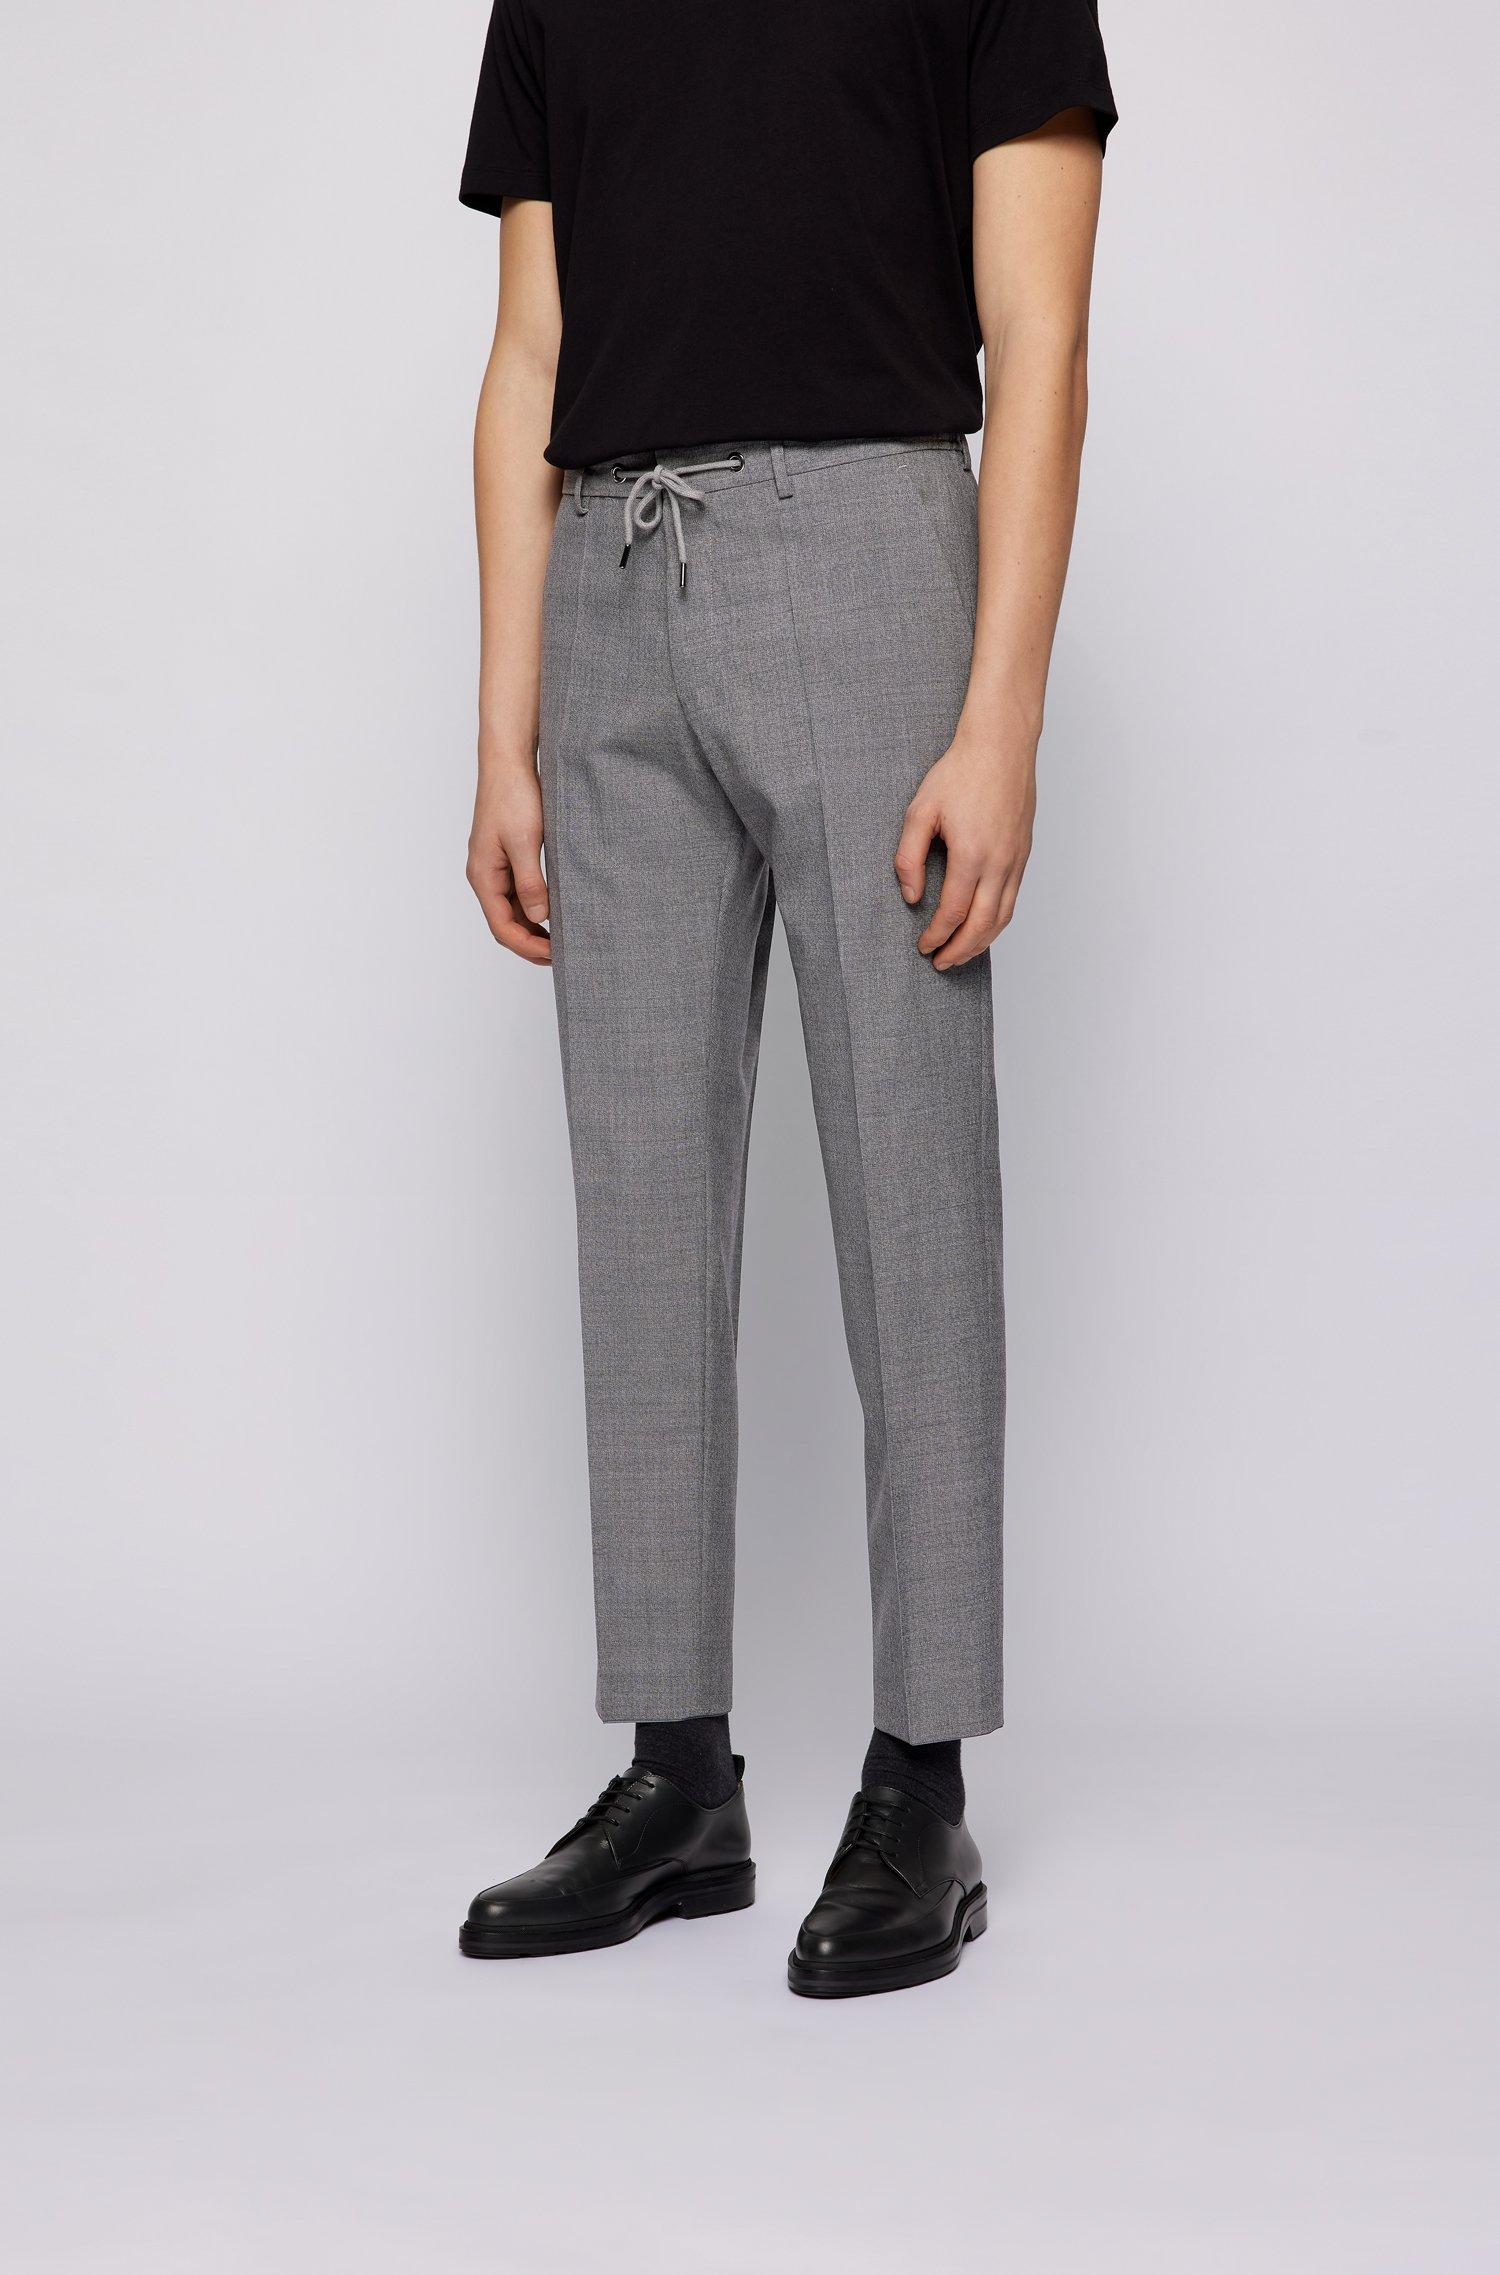 High-waisted slim-fit trousers in virgin wool, Grey